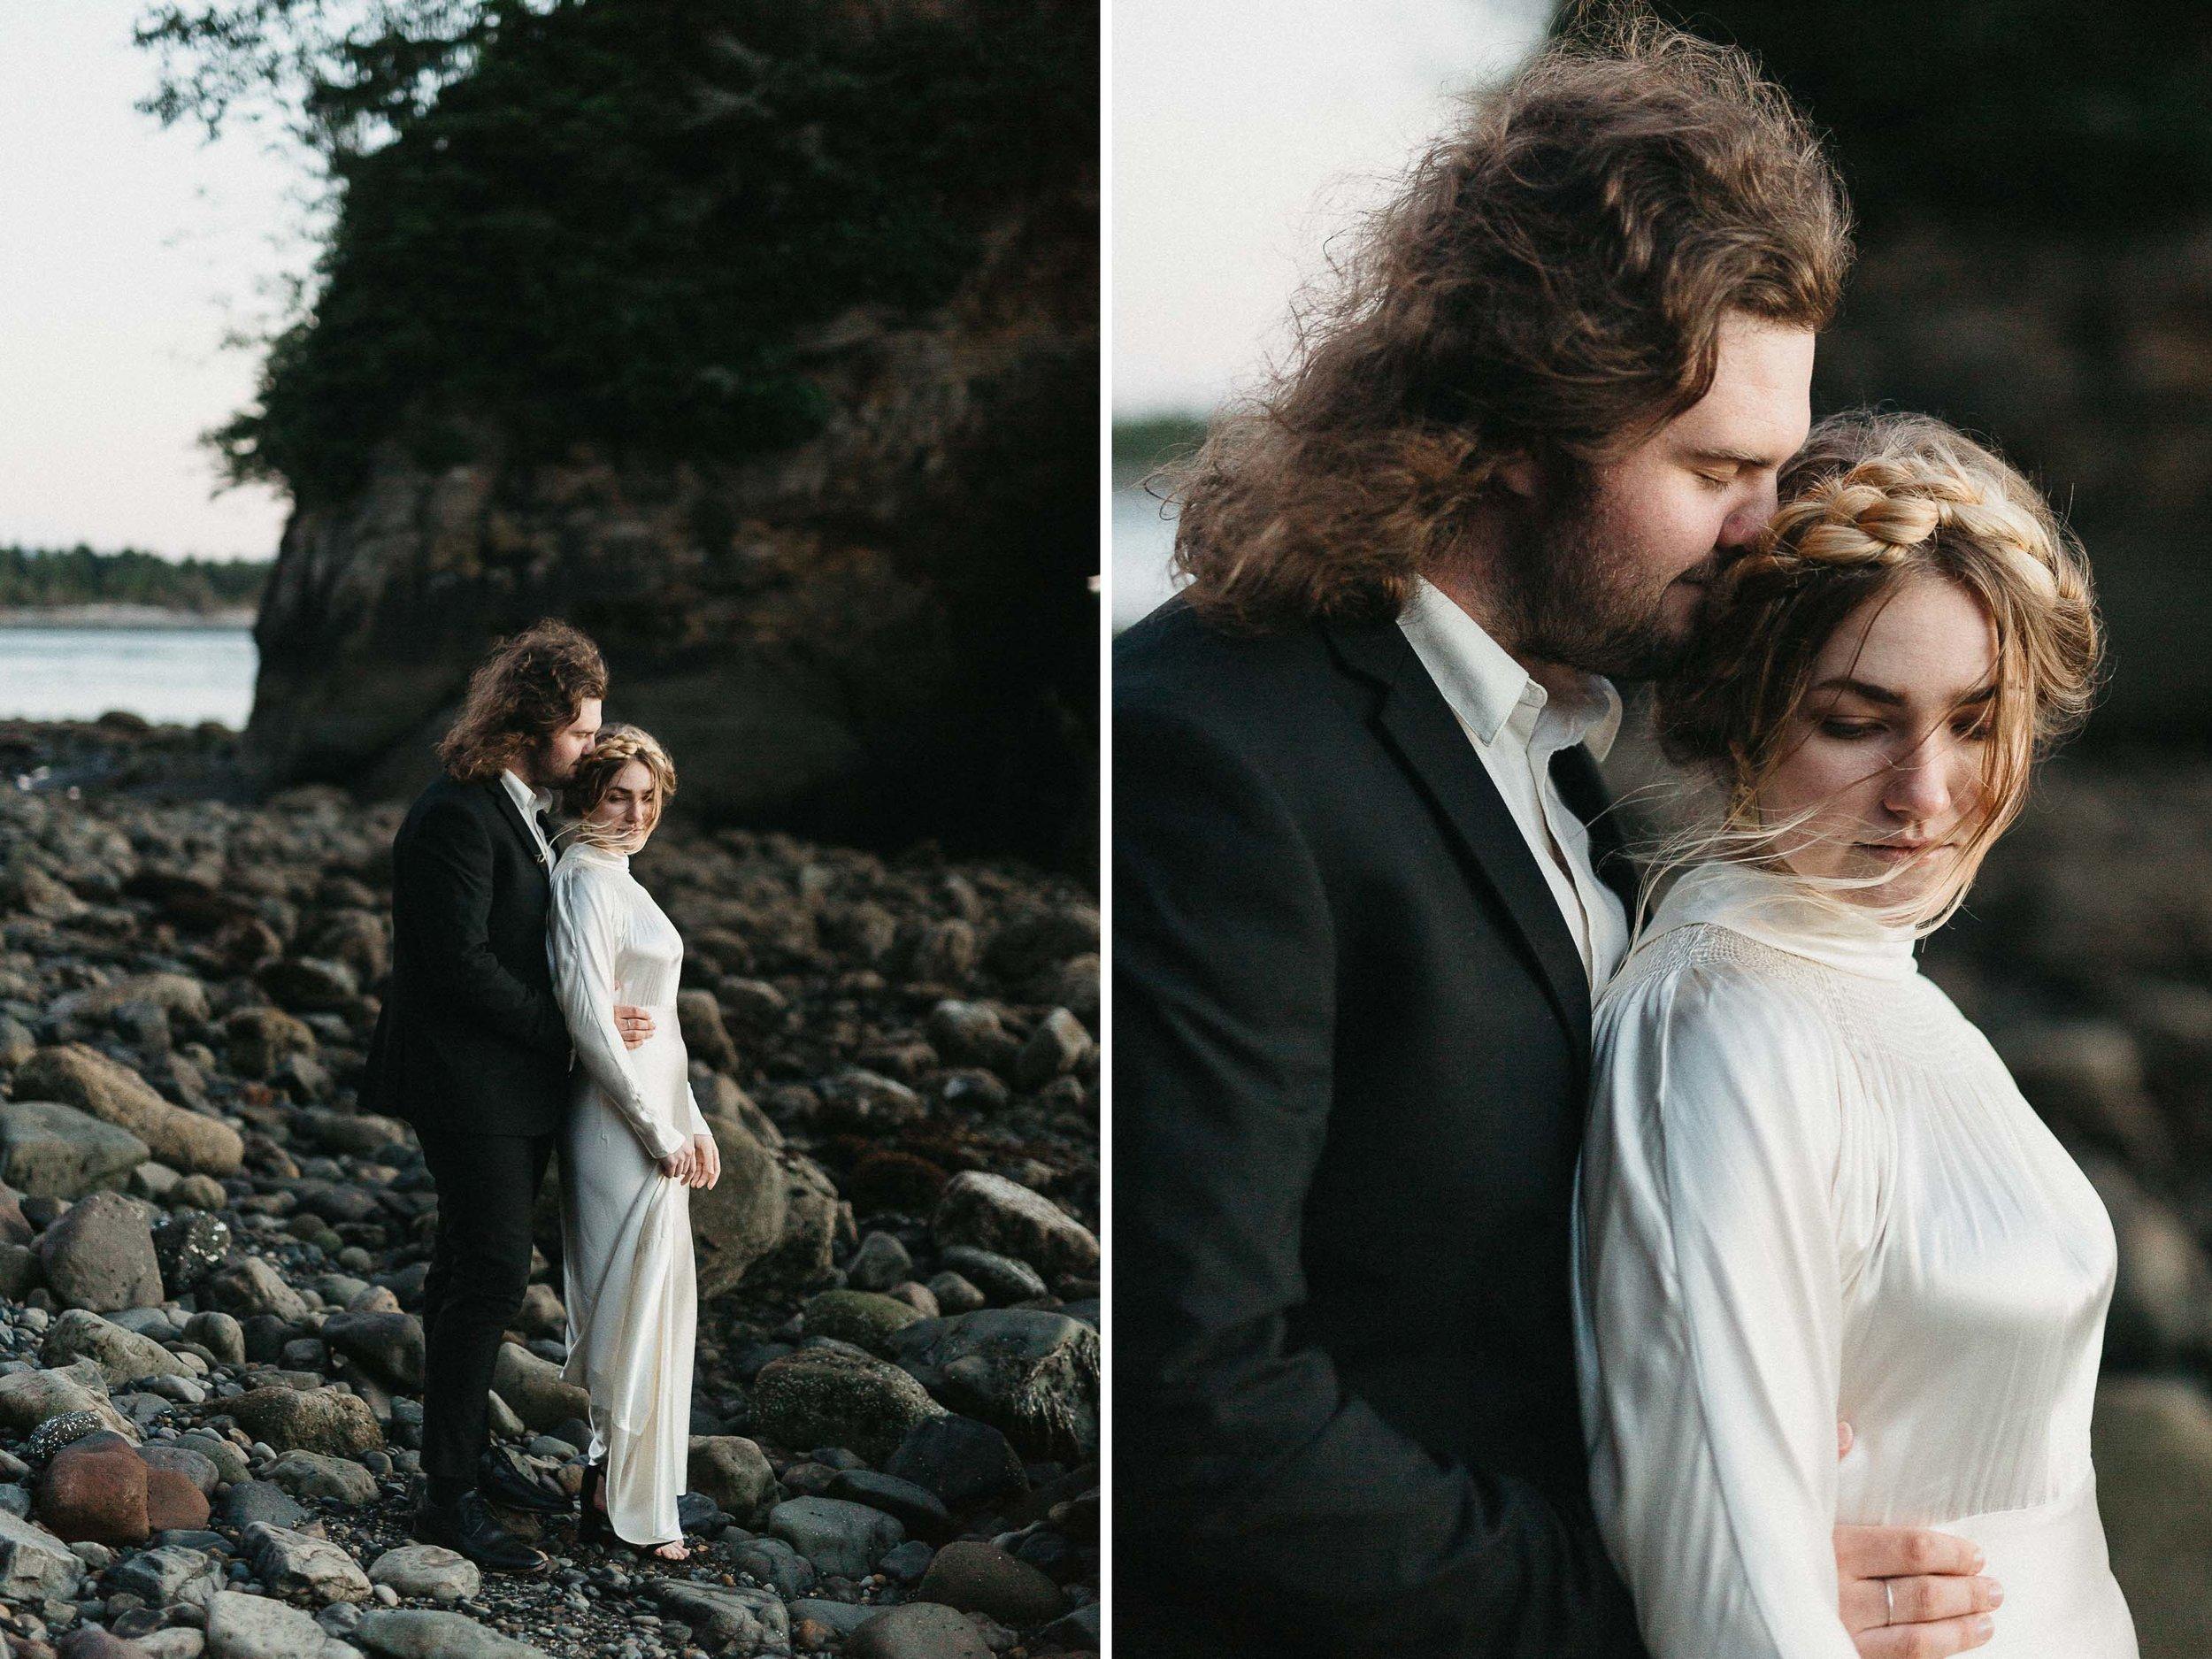 Oregon-Wedding-Photographer-07.jpg